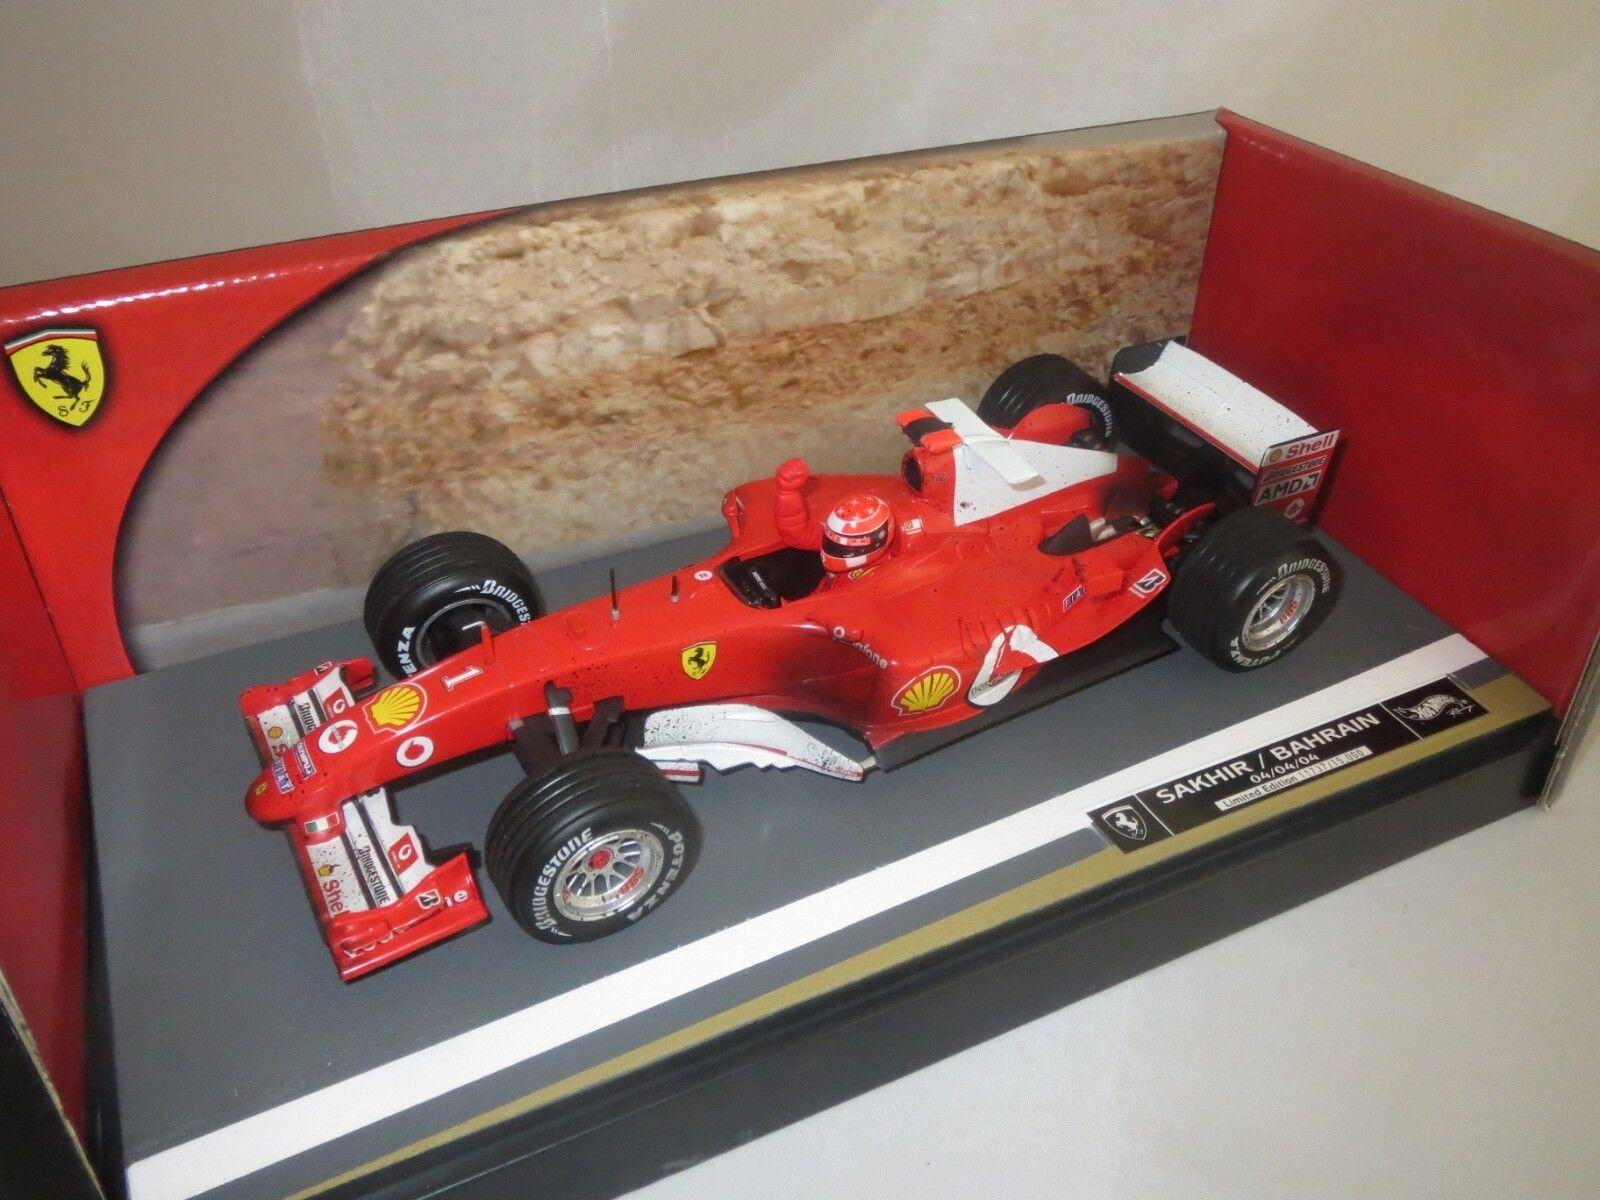 Mattel b6222  M. SCHUMACHER   1 (Sakhir Bahreïn)  f2004  1 18 neuf dans sa boîte (f21)